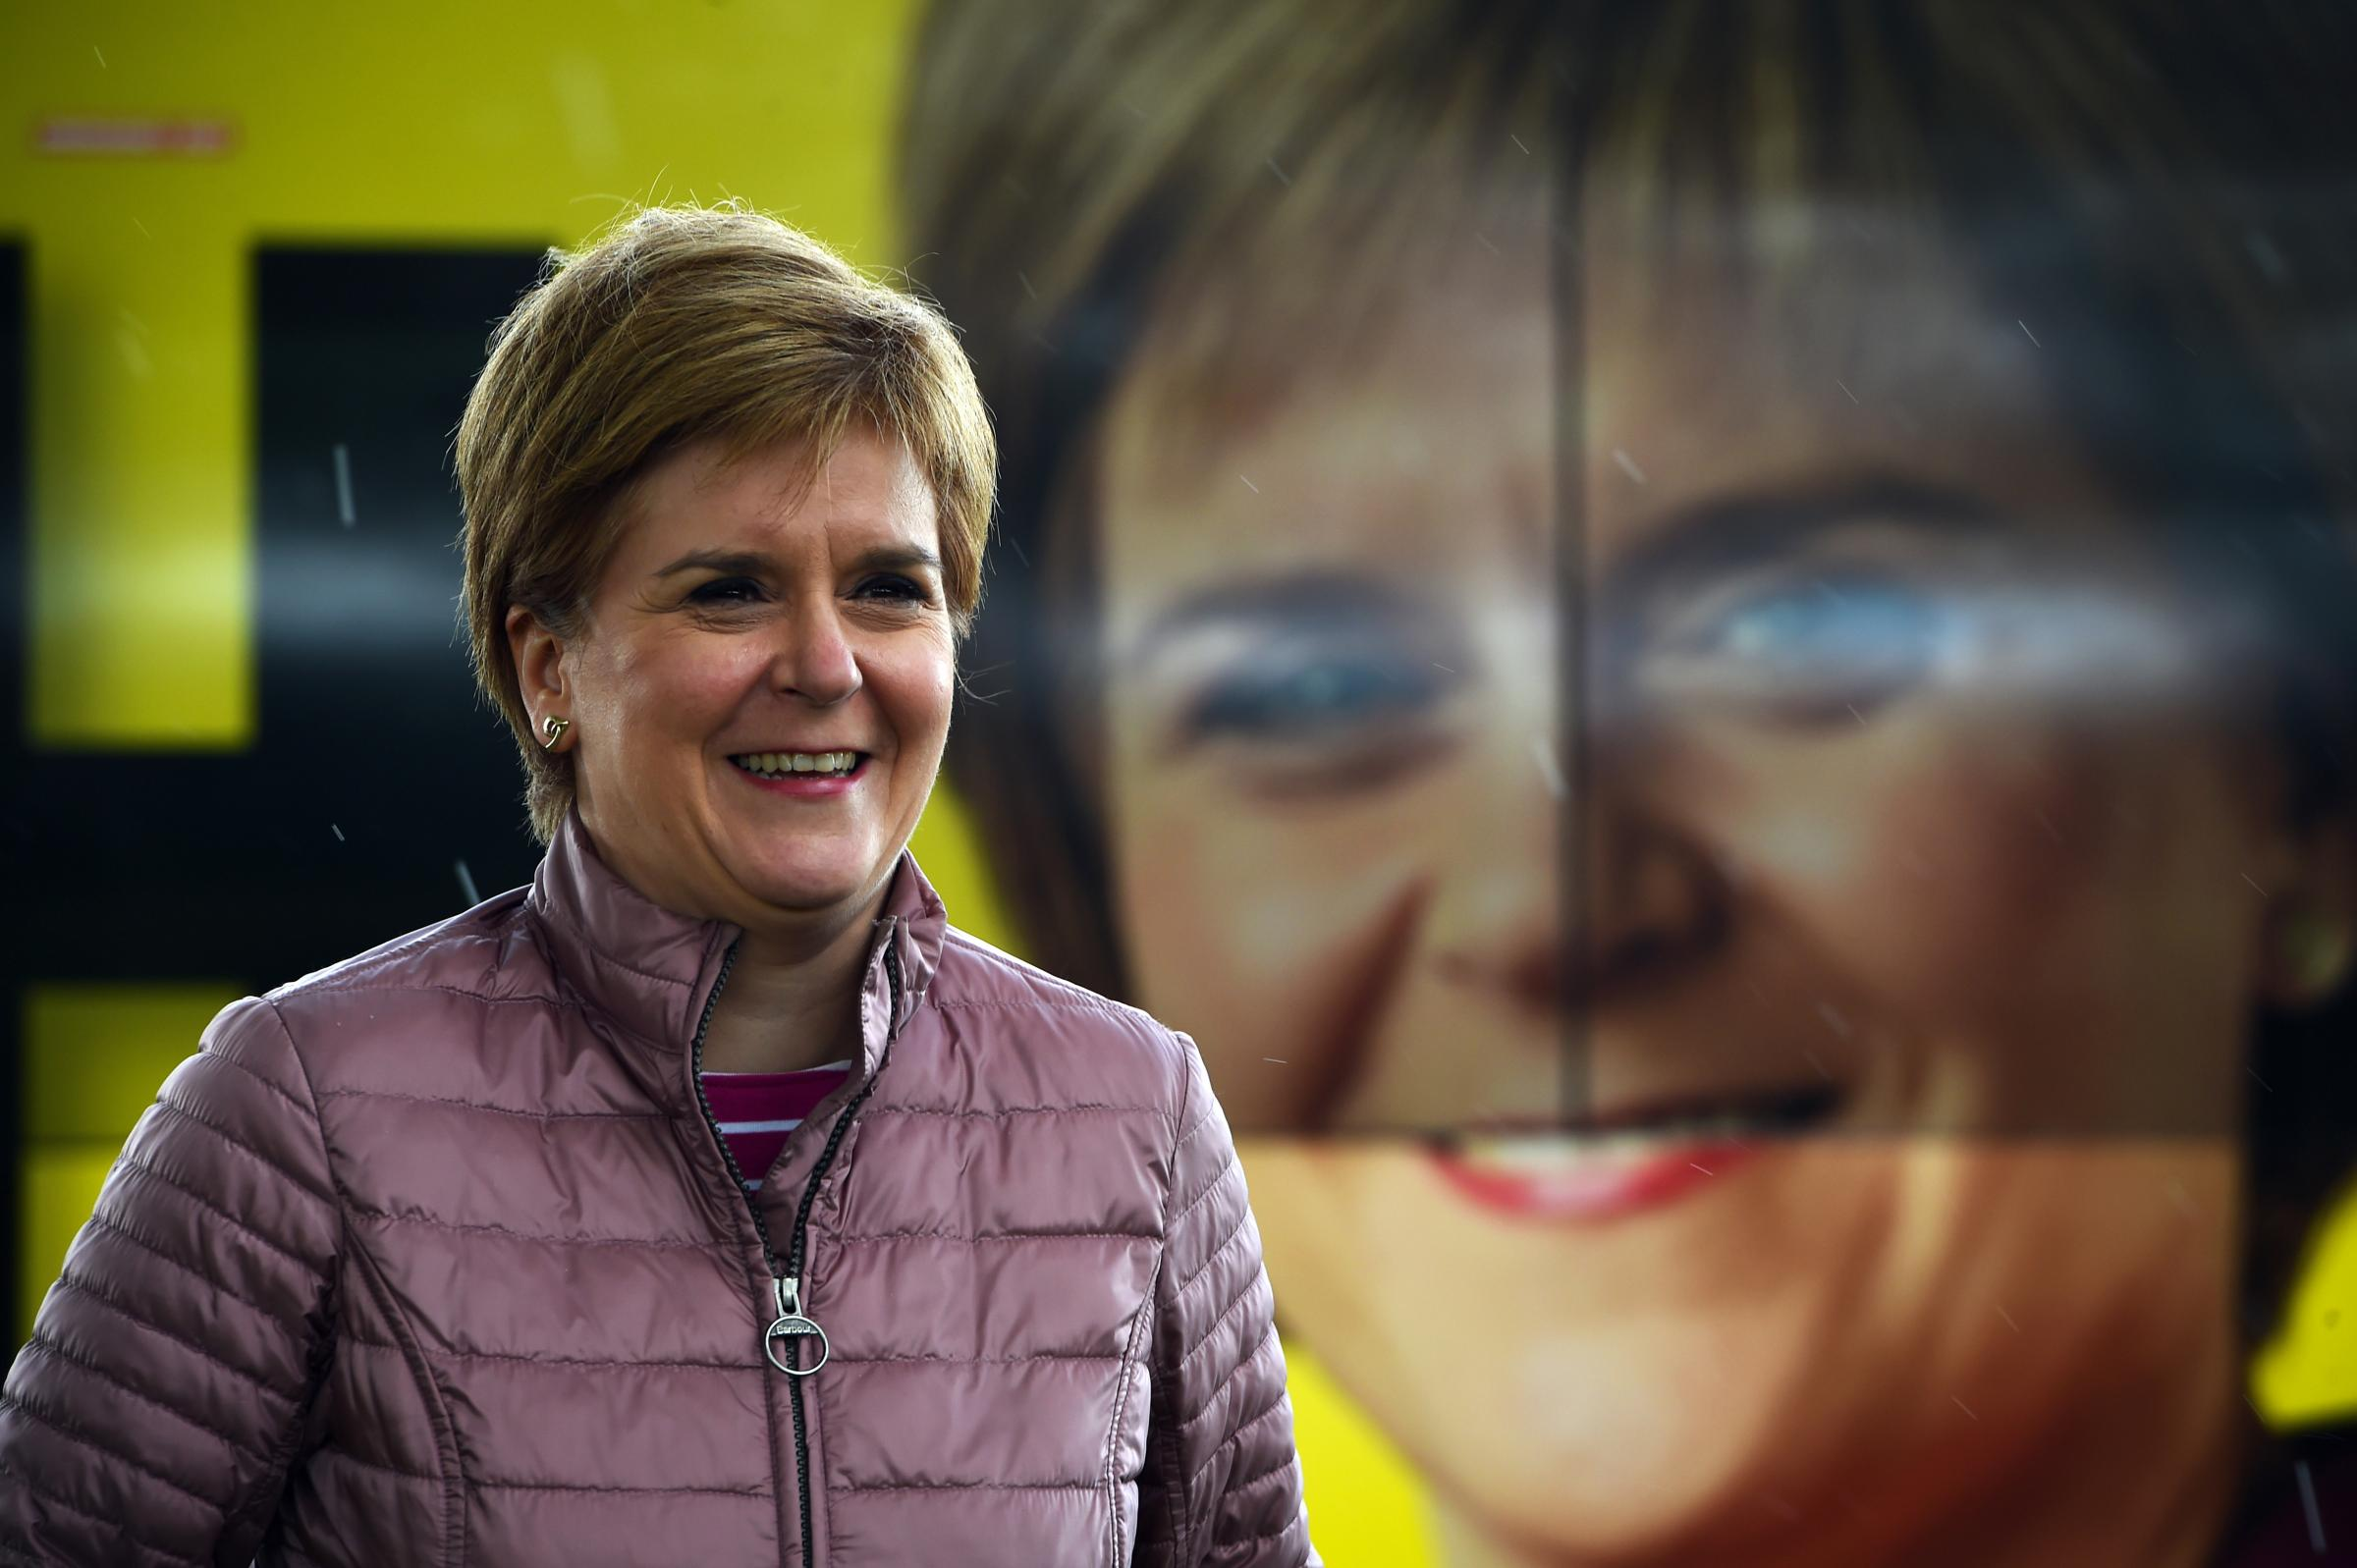 Nicola Sturgeon: A vote for the SNP  is a chance to decide Scotland's future